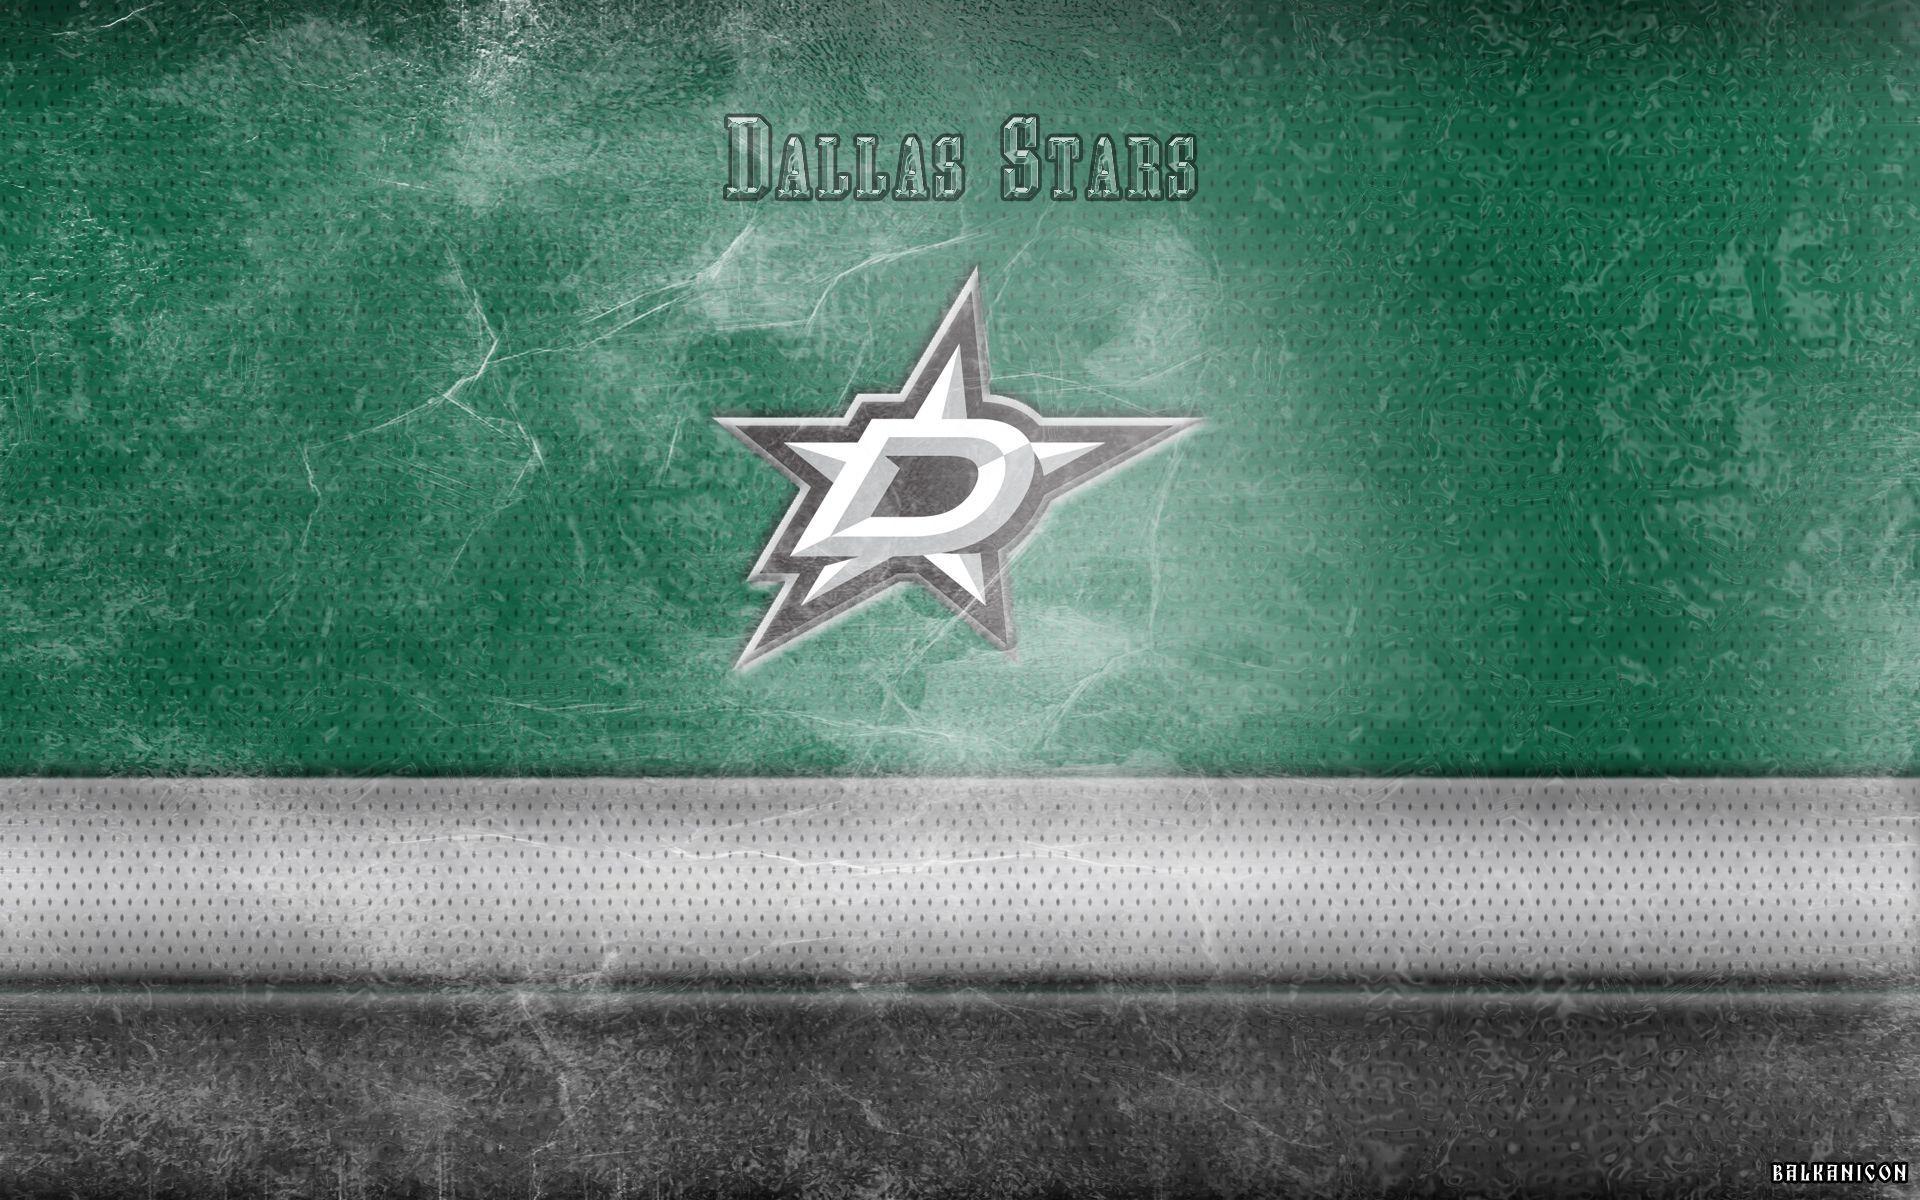 Dallas Stars Background Wallpaper - WallpaperSafari